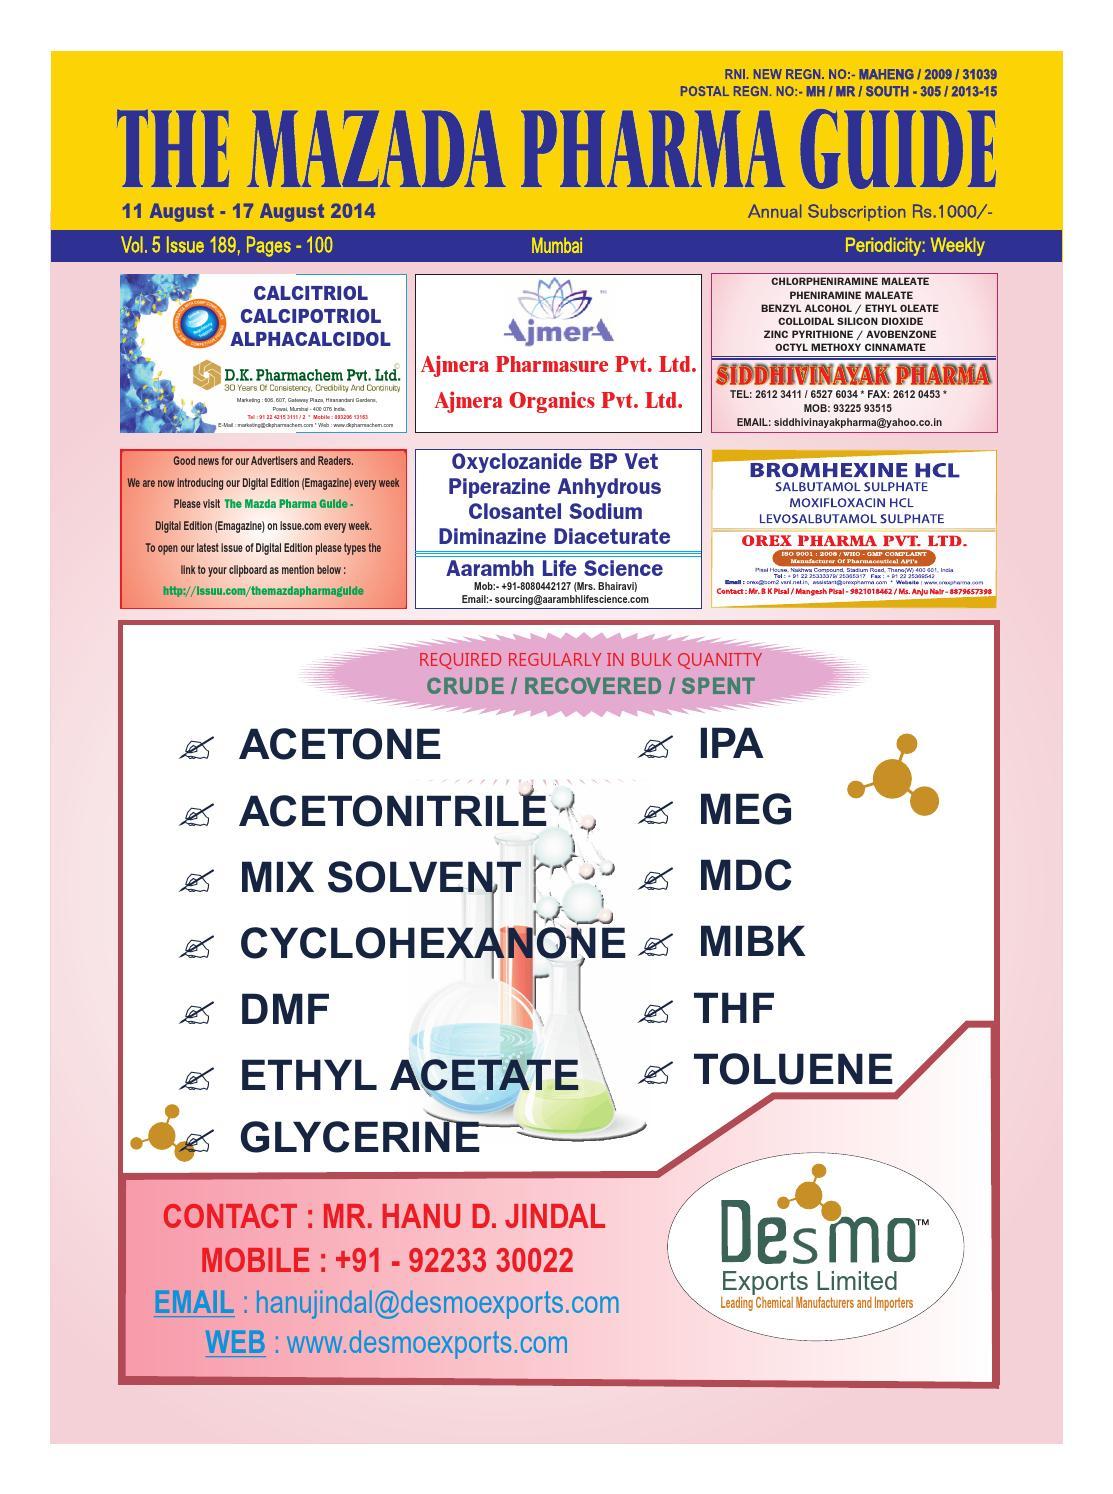 Levofloxacin hemihydrate usp 35 monograph.doc - The Mazada Pharma Guide 11th Aug 17th Aug 2014 By The Mazada Pharma Guide Issuu